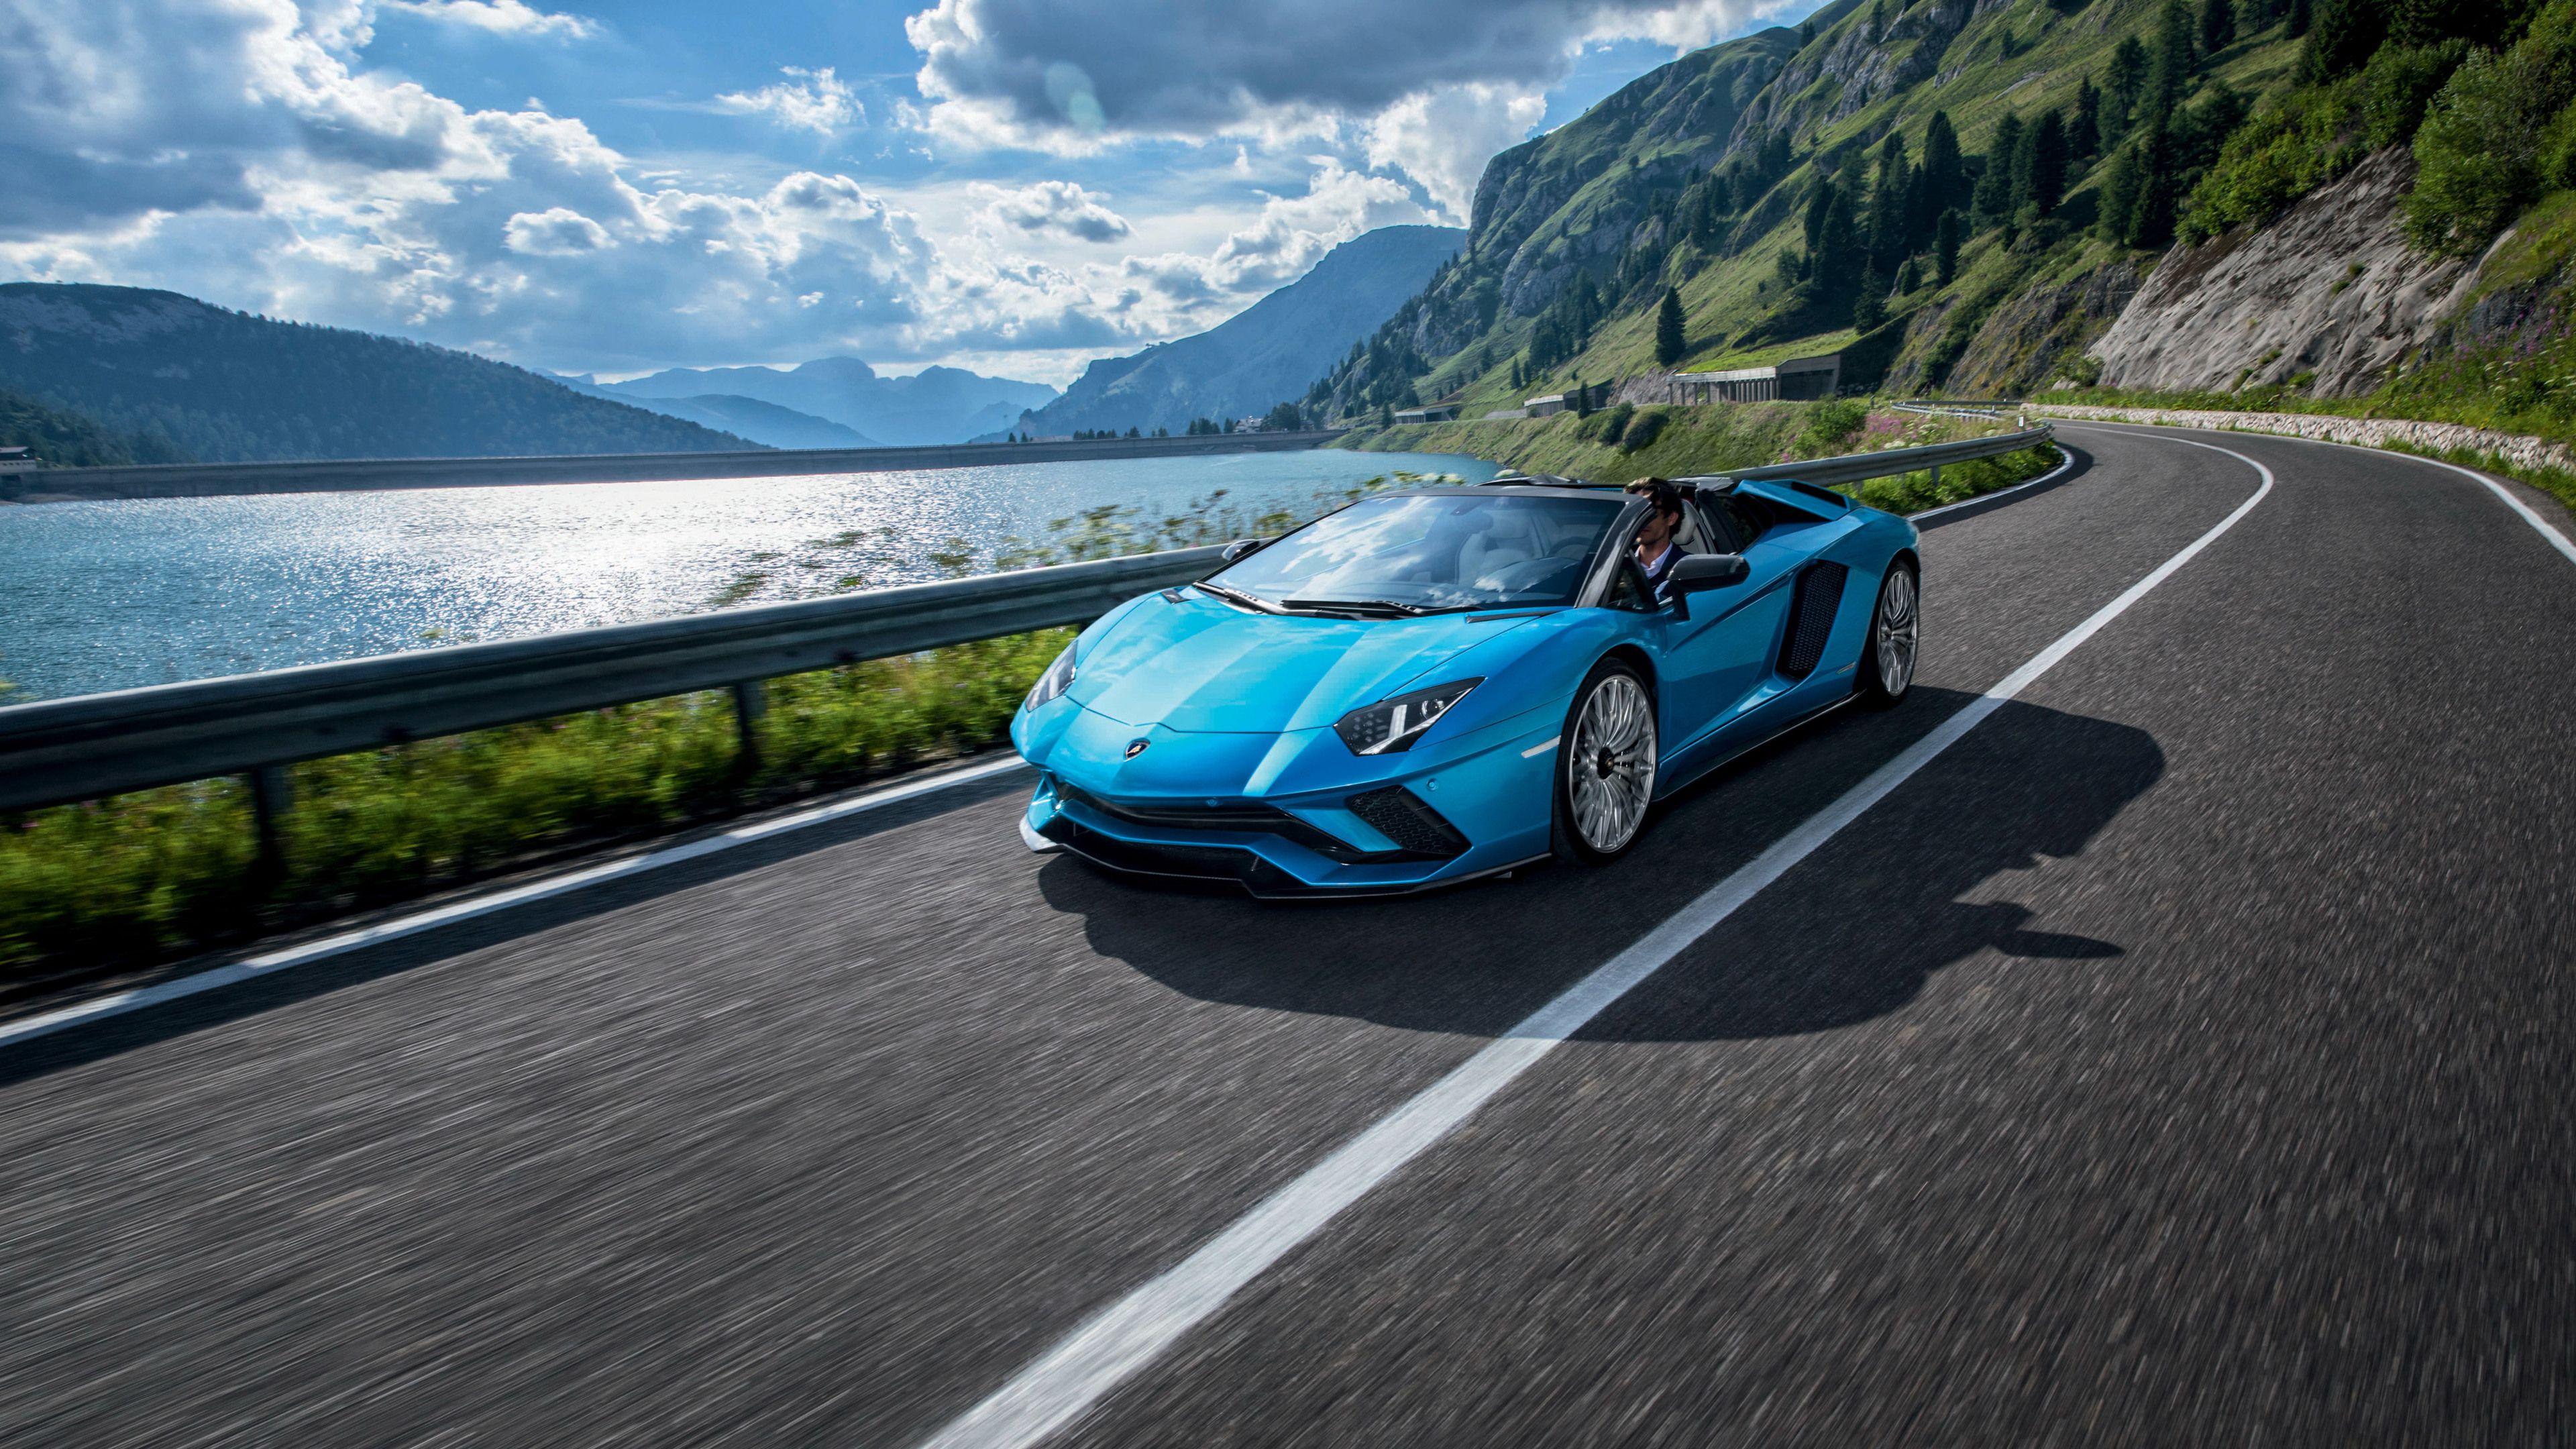 Lamborghini Aventador S Roadster 2017 lamborghini wallpapers, lamborghini aventa…